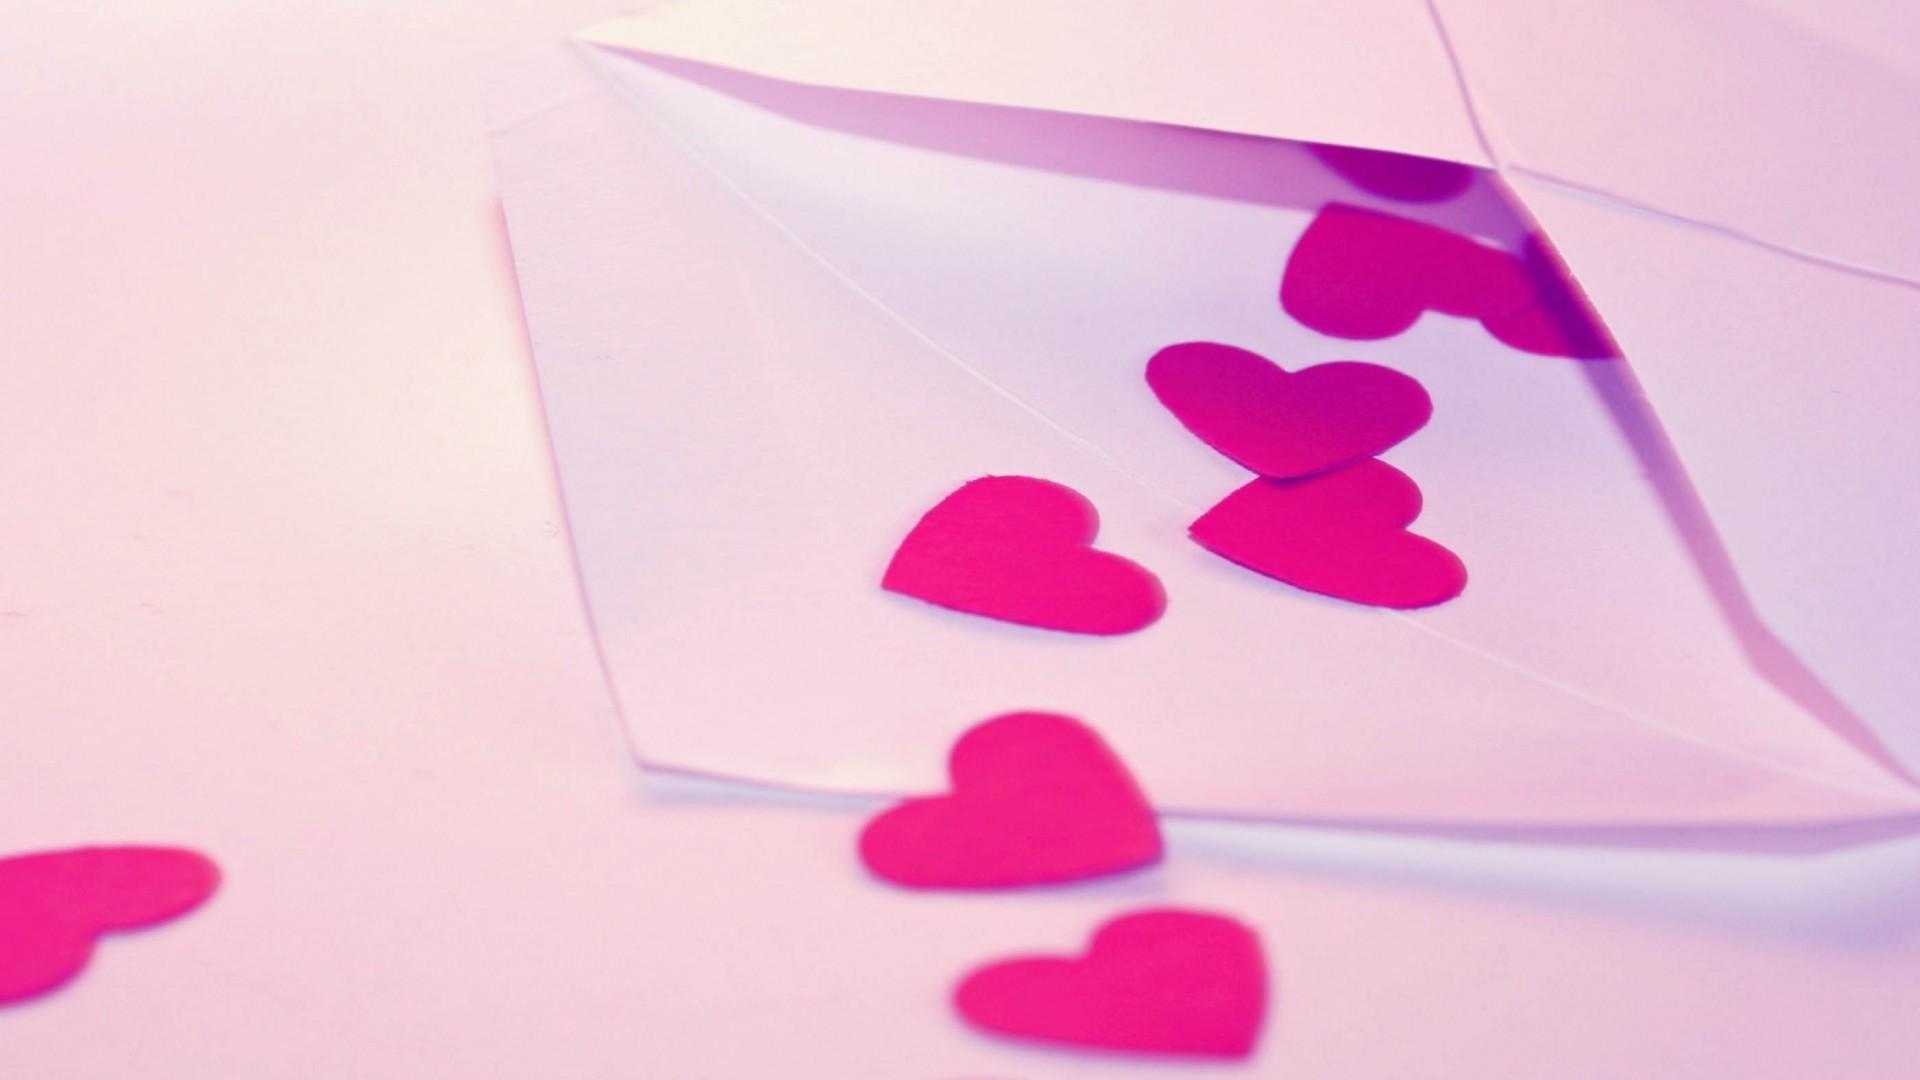 Download Love Desktop Wallpaper Live Hd Wallpaper Hq Pictures Images